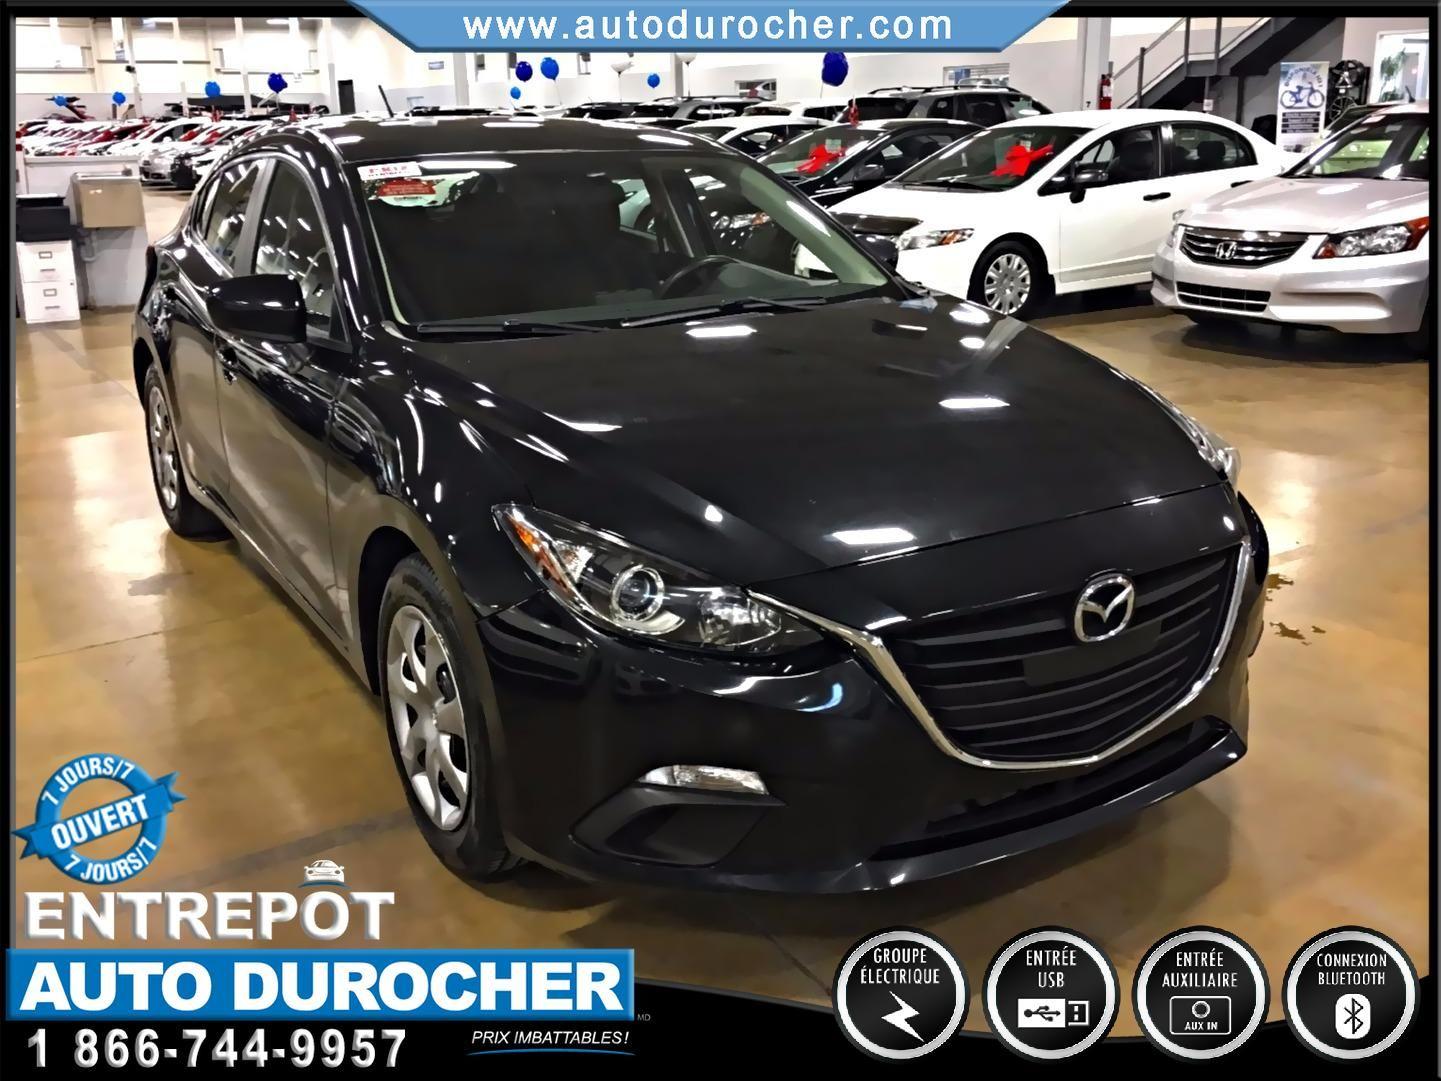 2014 Mazda Mazda3 GX-SKY NOUVEAU MODÈLE FINANCEMENT DISPONIBLE